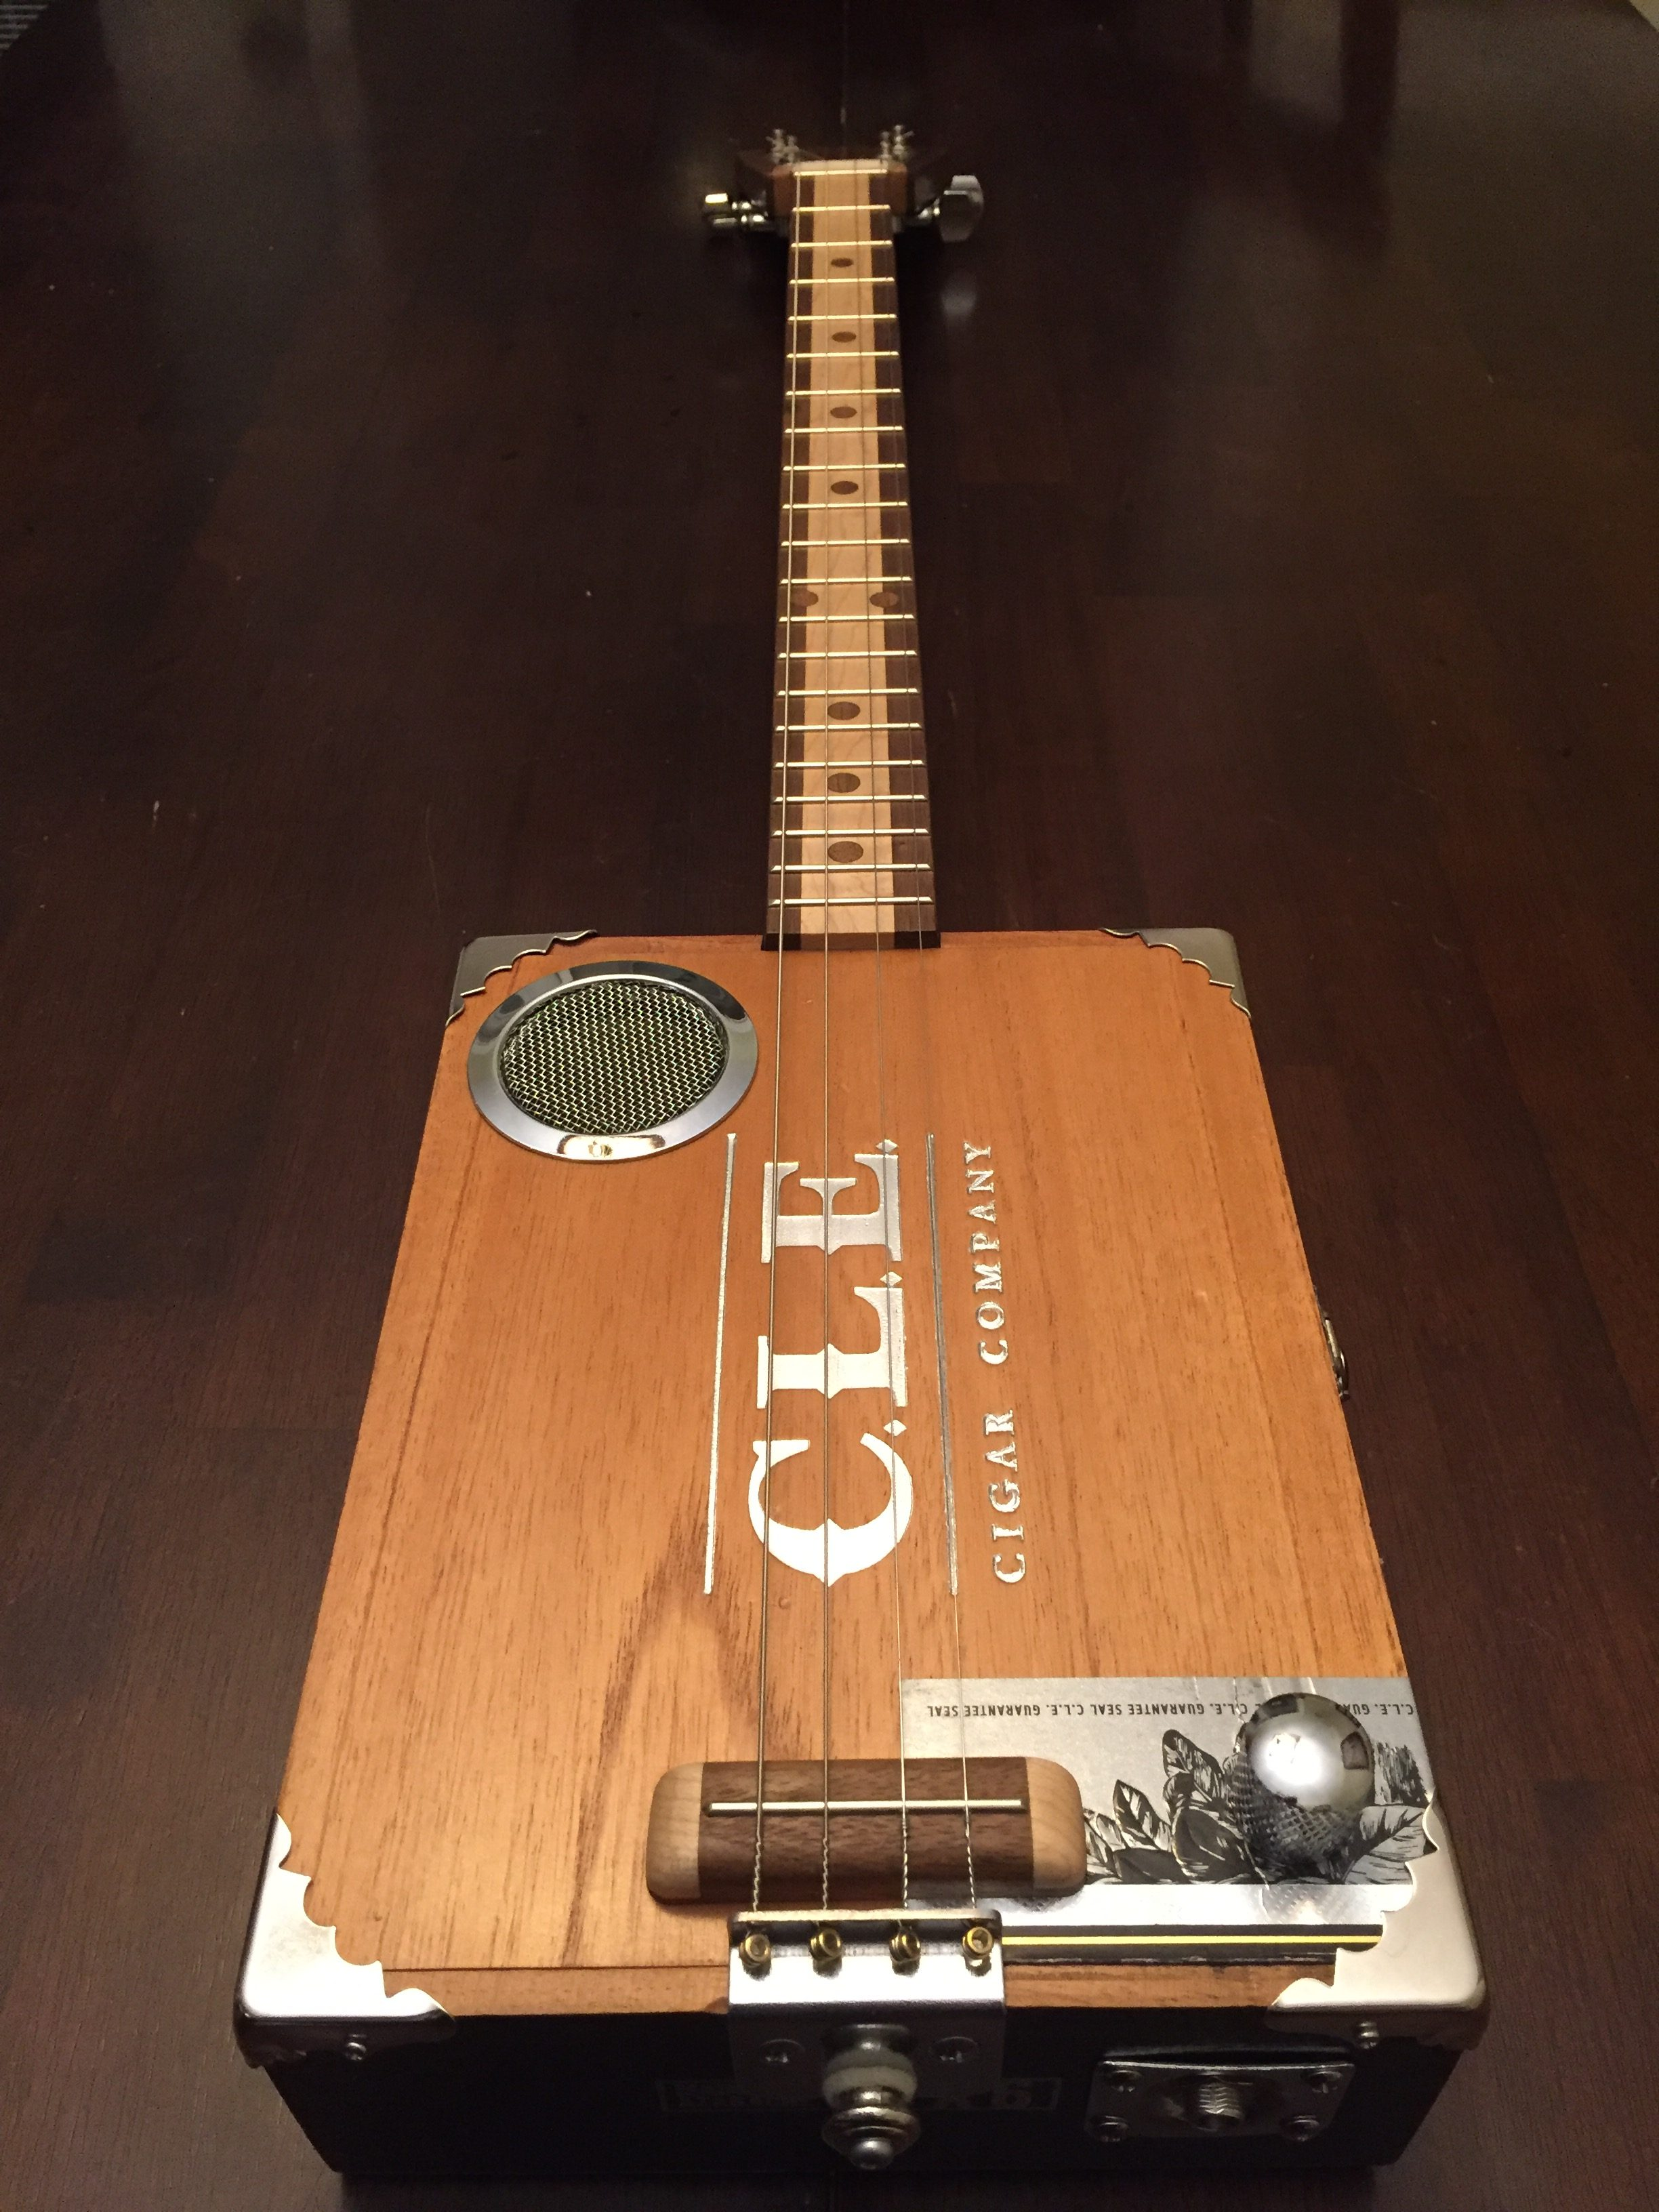 CLE Cigar Box Guitar Build - Full view